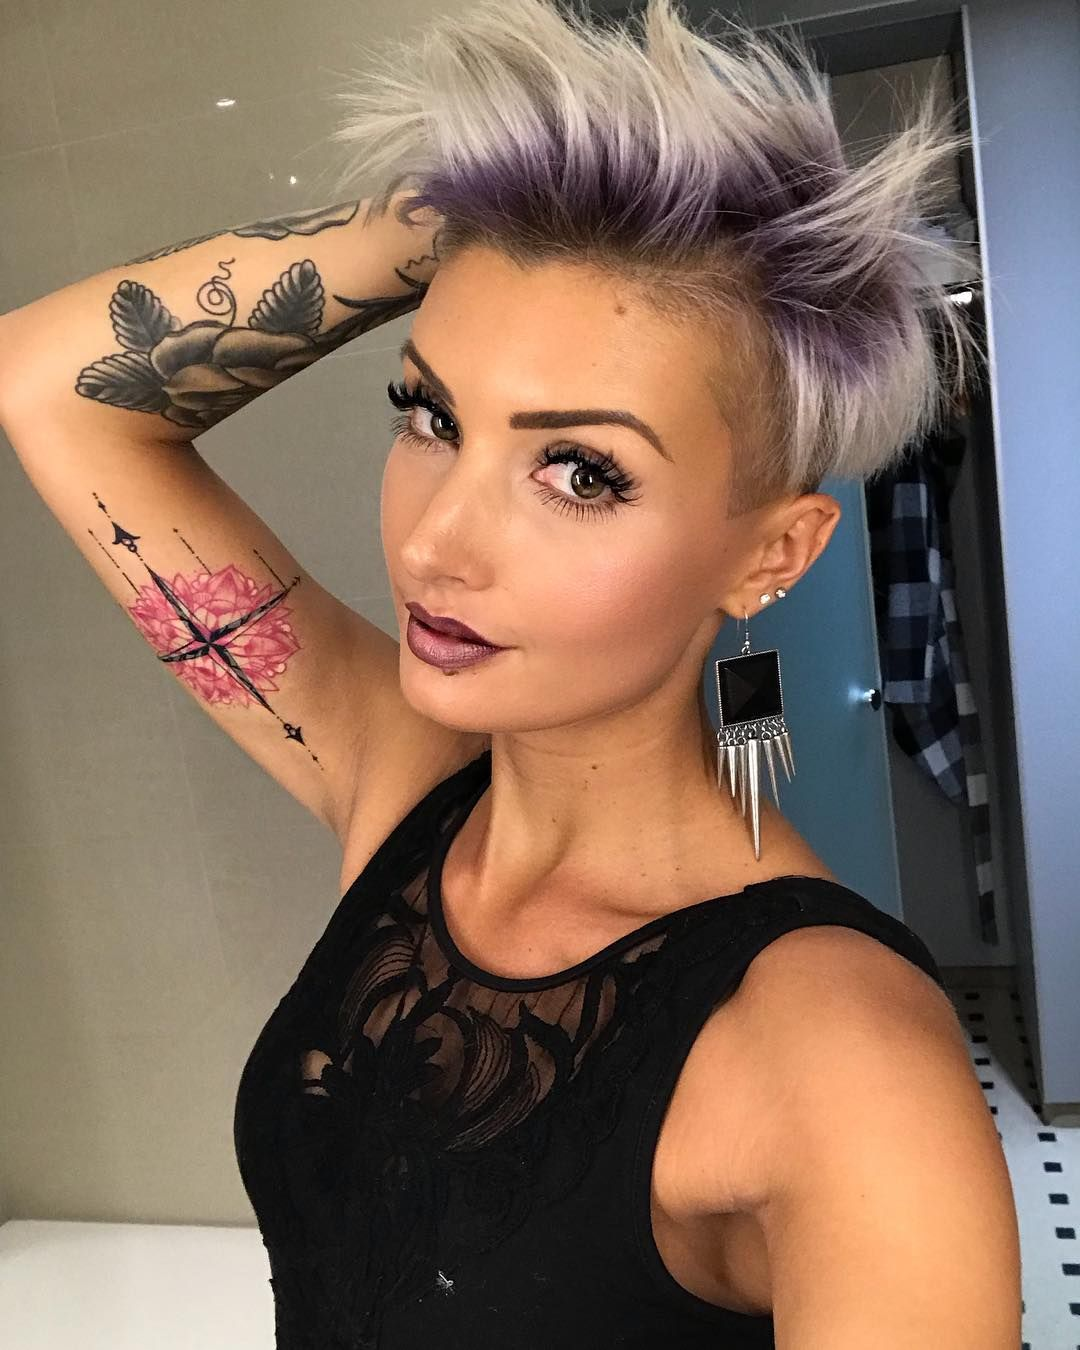 Pin by Kristina Wayt on pixie cut in 2019   Hair, Hair ...